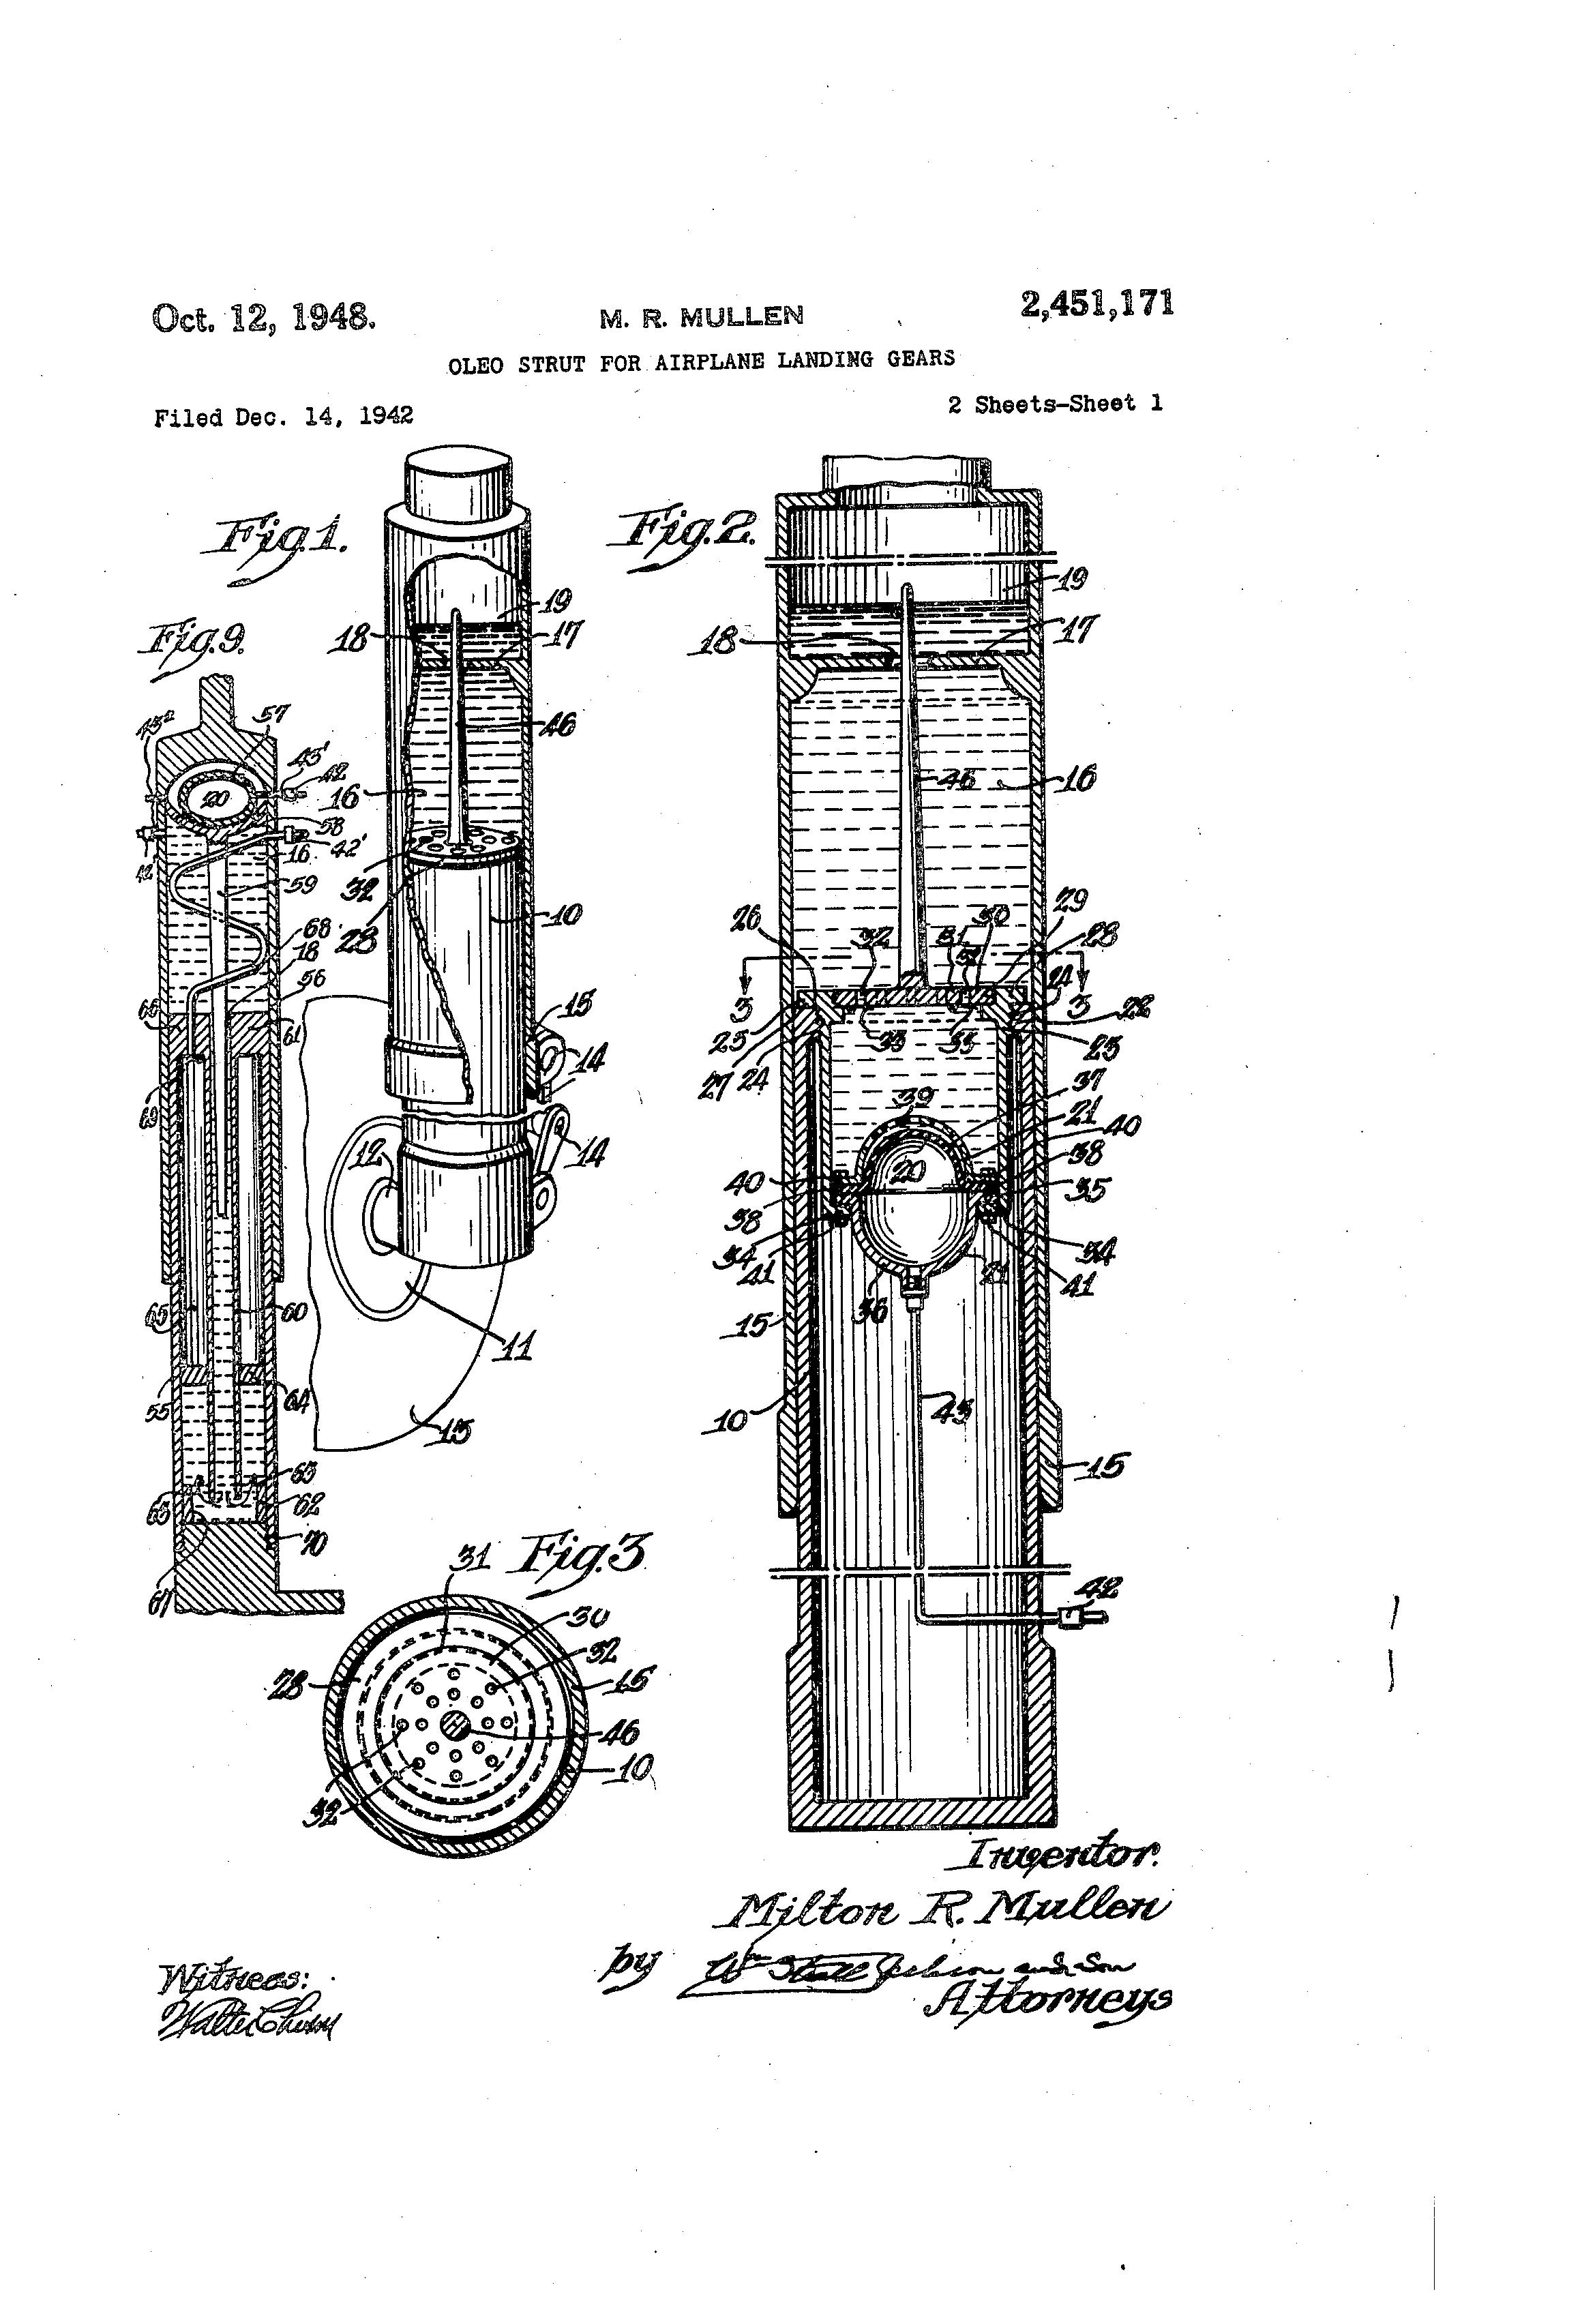 oleo strut diagram ford f 350 front strut diagram patent us2451171 - oleo strut for airplane landing gears ...